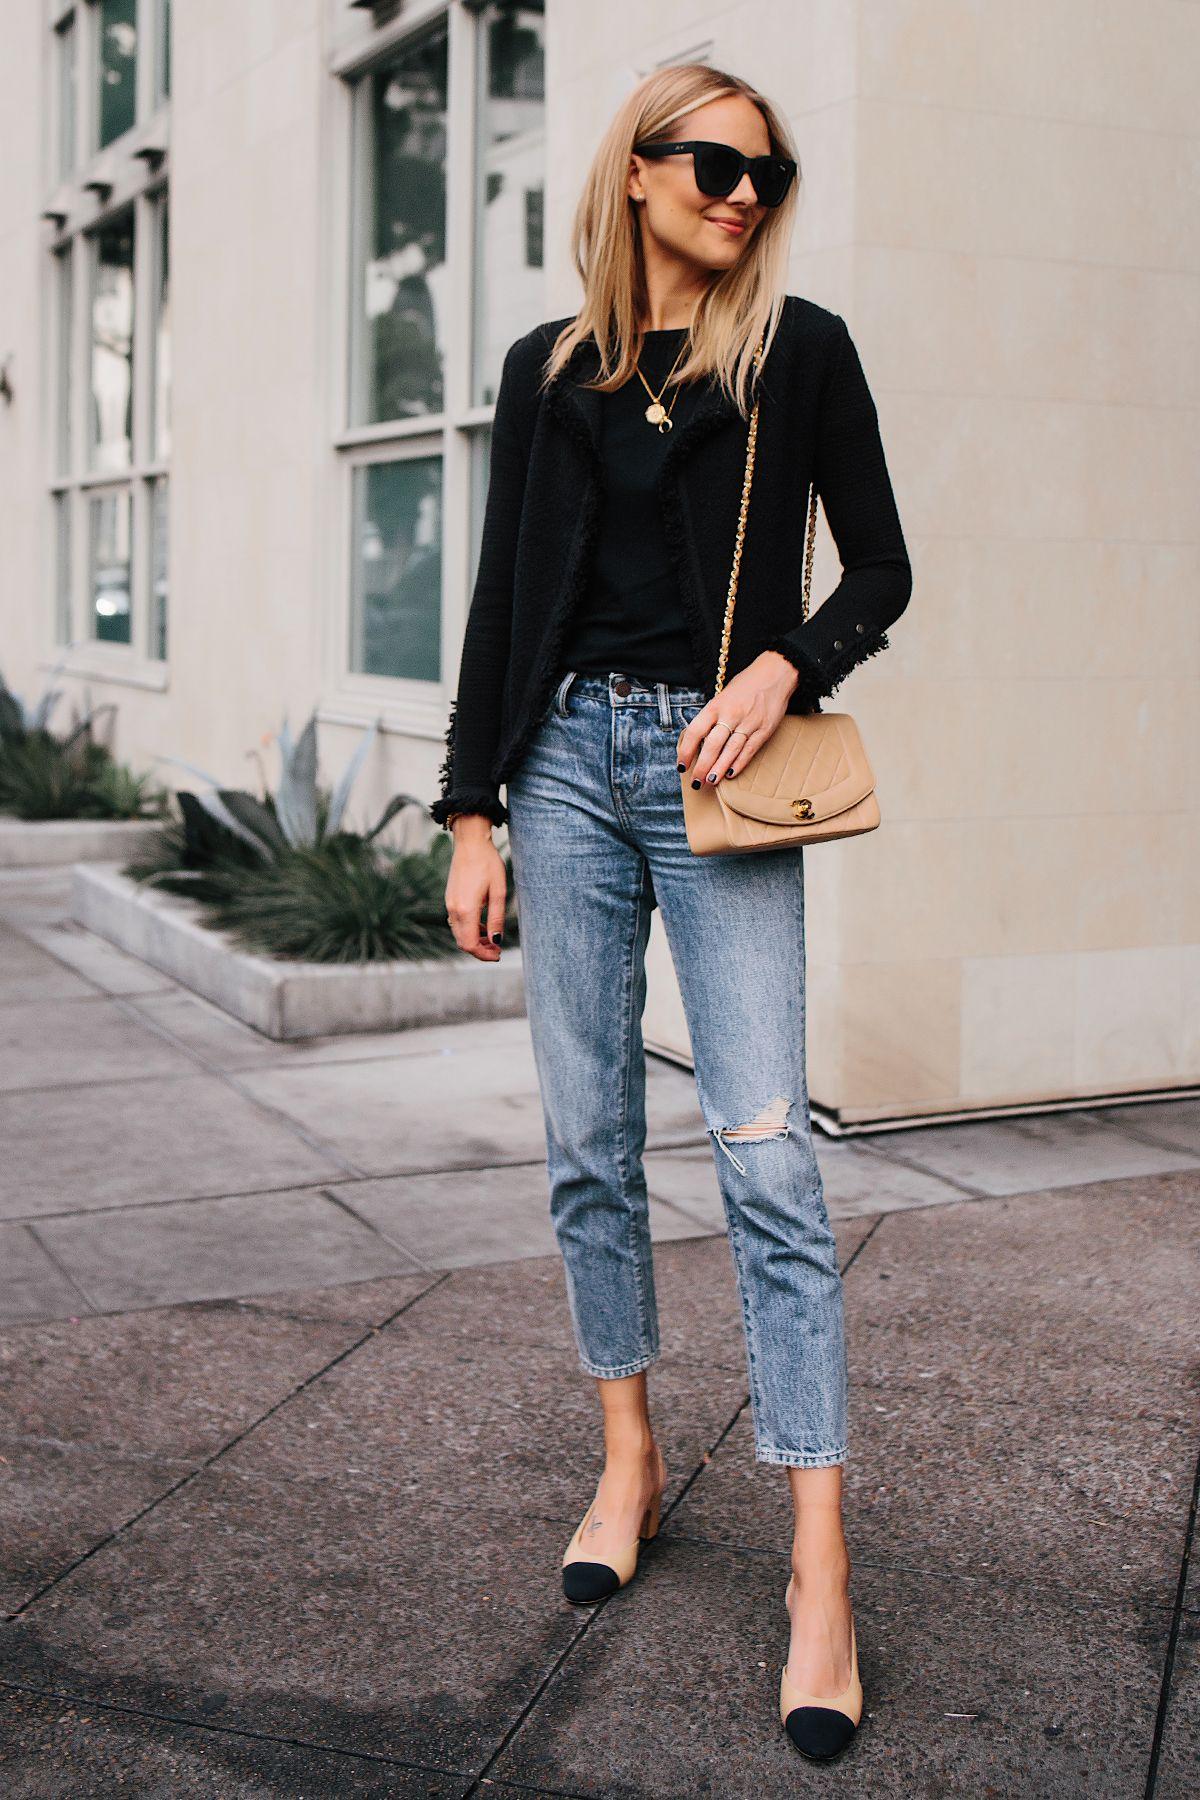 9f73b004175 Fashion Jackson Black Tweed Relaxed Jacket Jeans Outfit Chanel Tan Diana  Handbag Chanel Slingback Shoes